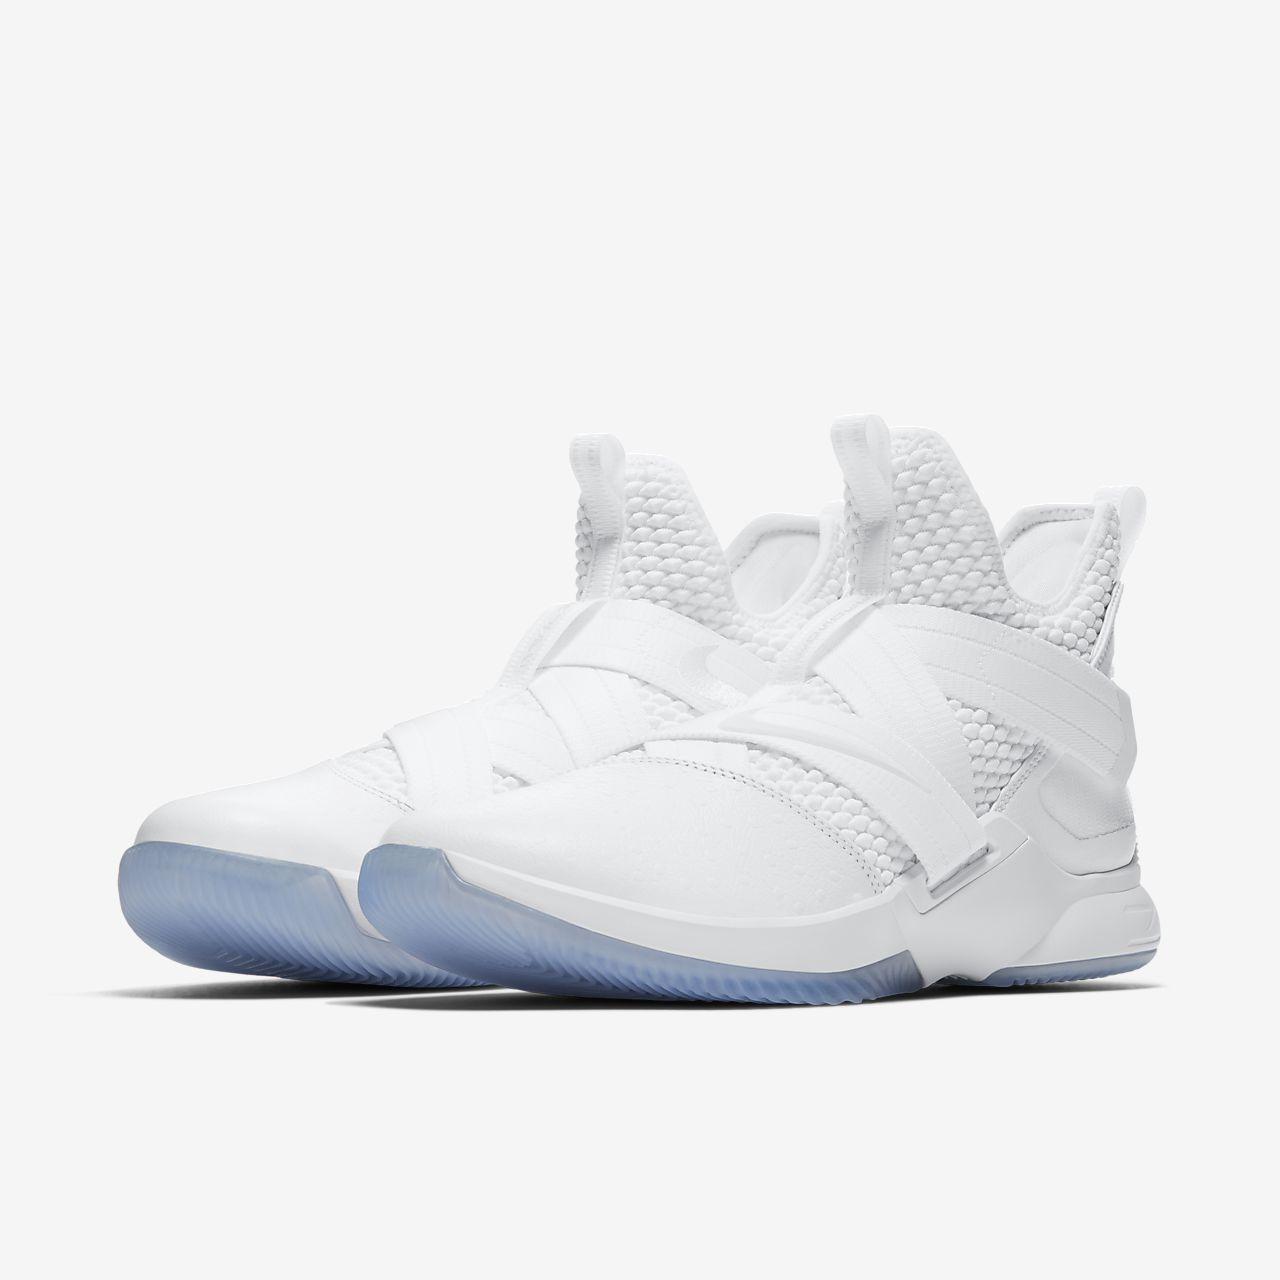 free shipping ca857 3253b ... Chaussure de basketball LeBron Soldier 12 SFG